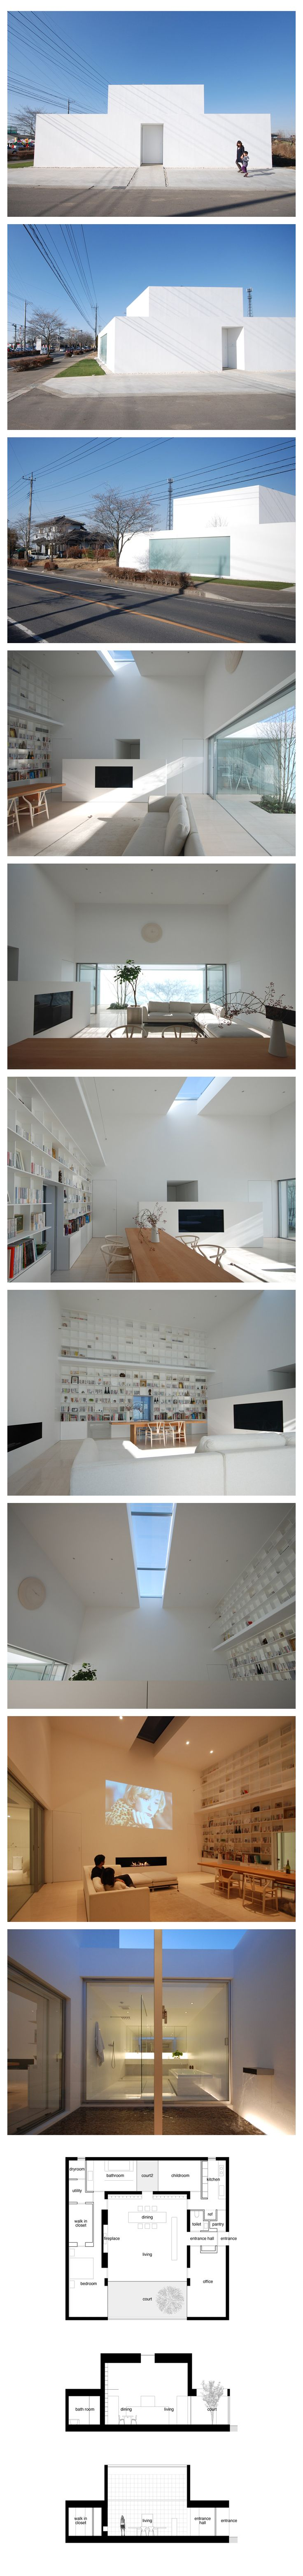 Library house by shinichi ogawa associates minimalist architecturejapanese architectureeditorial designmodern